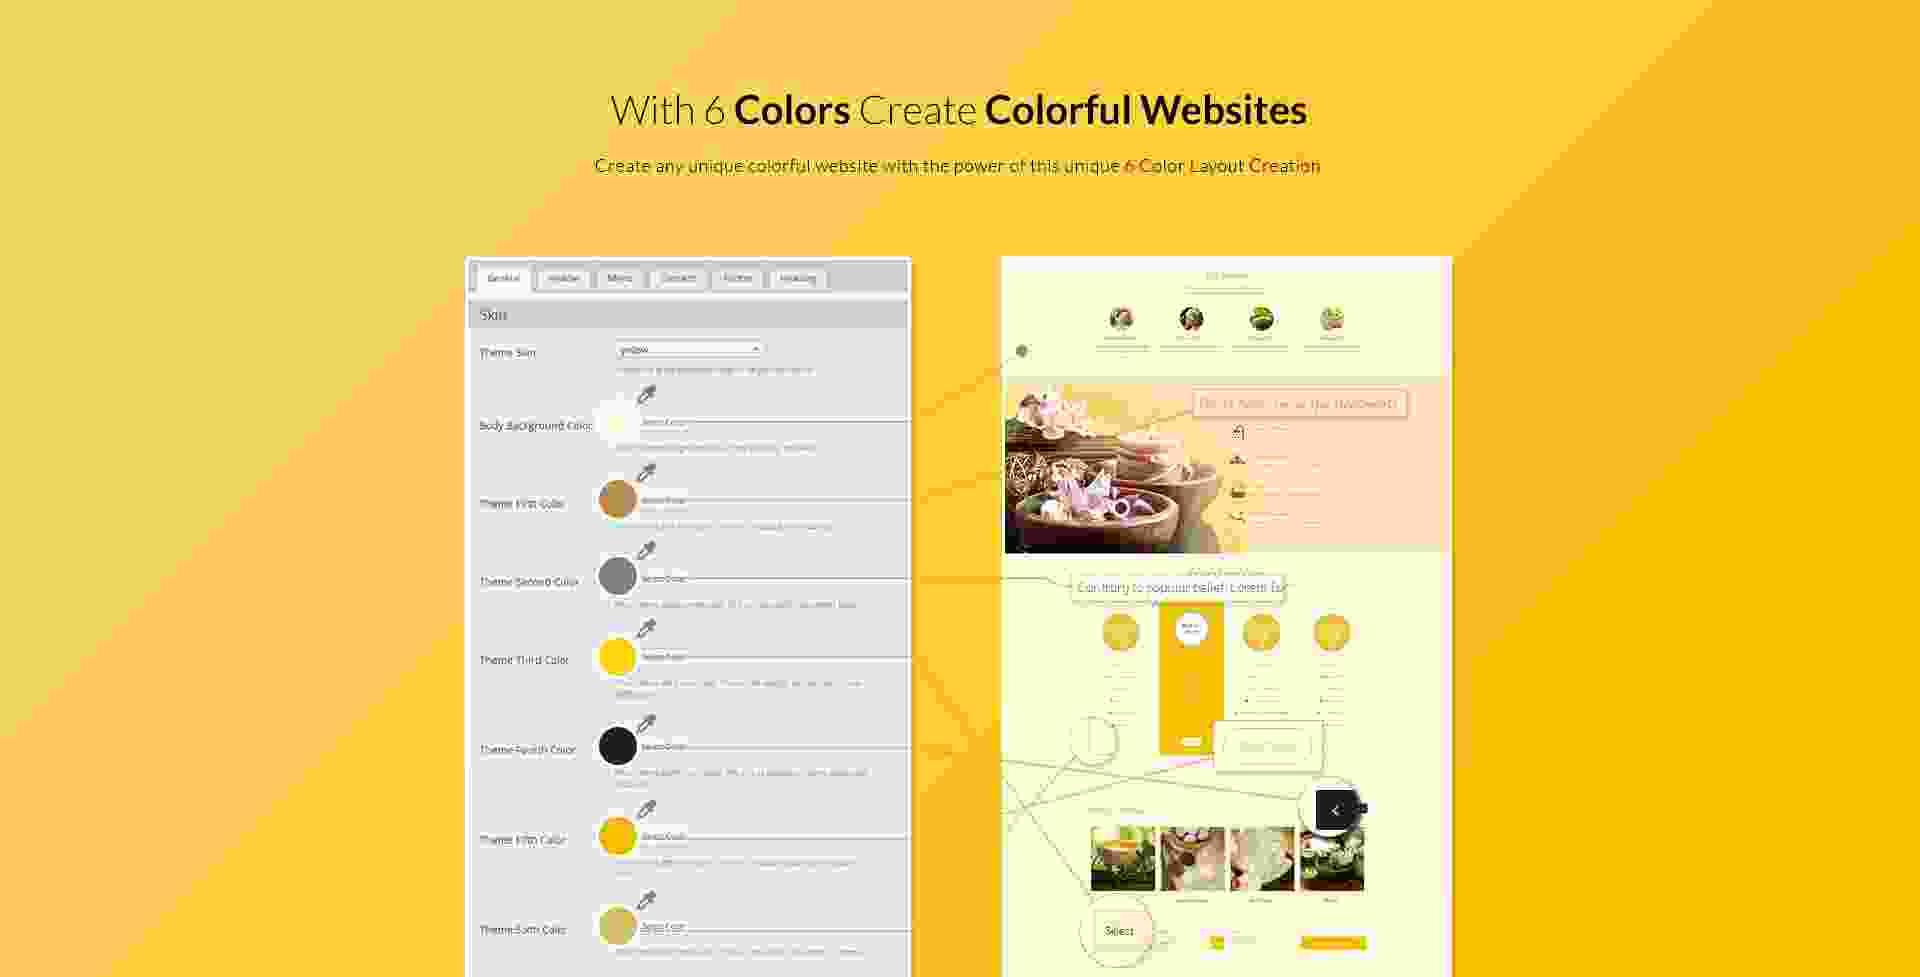 6 colors